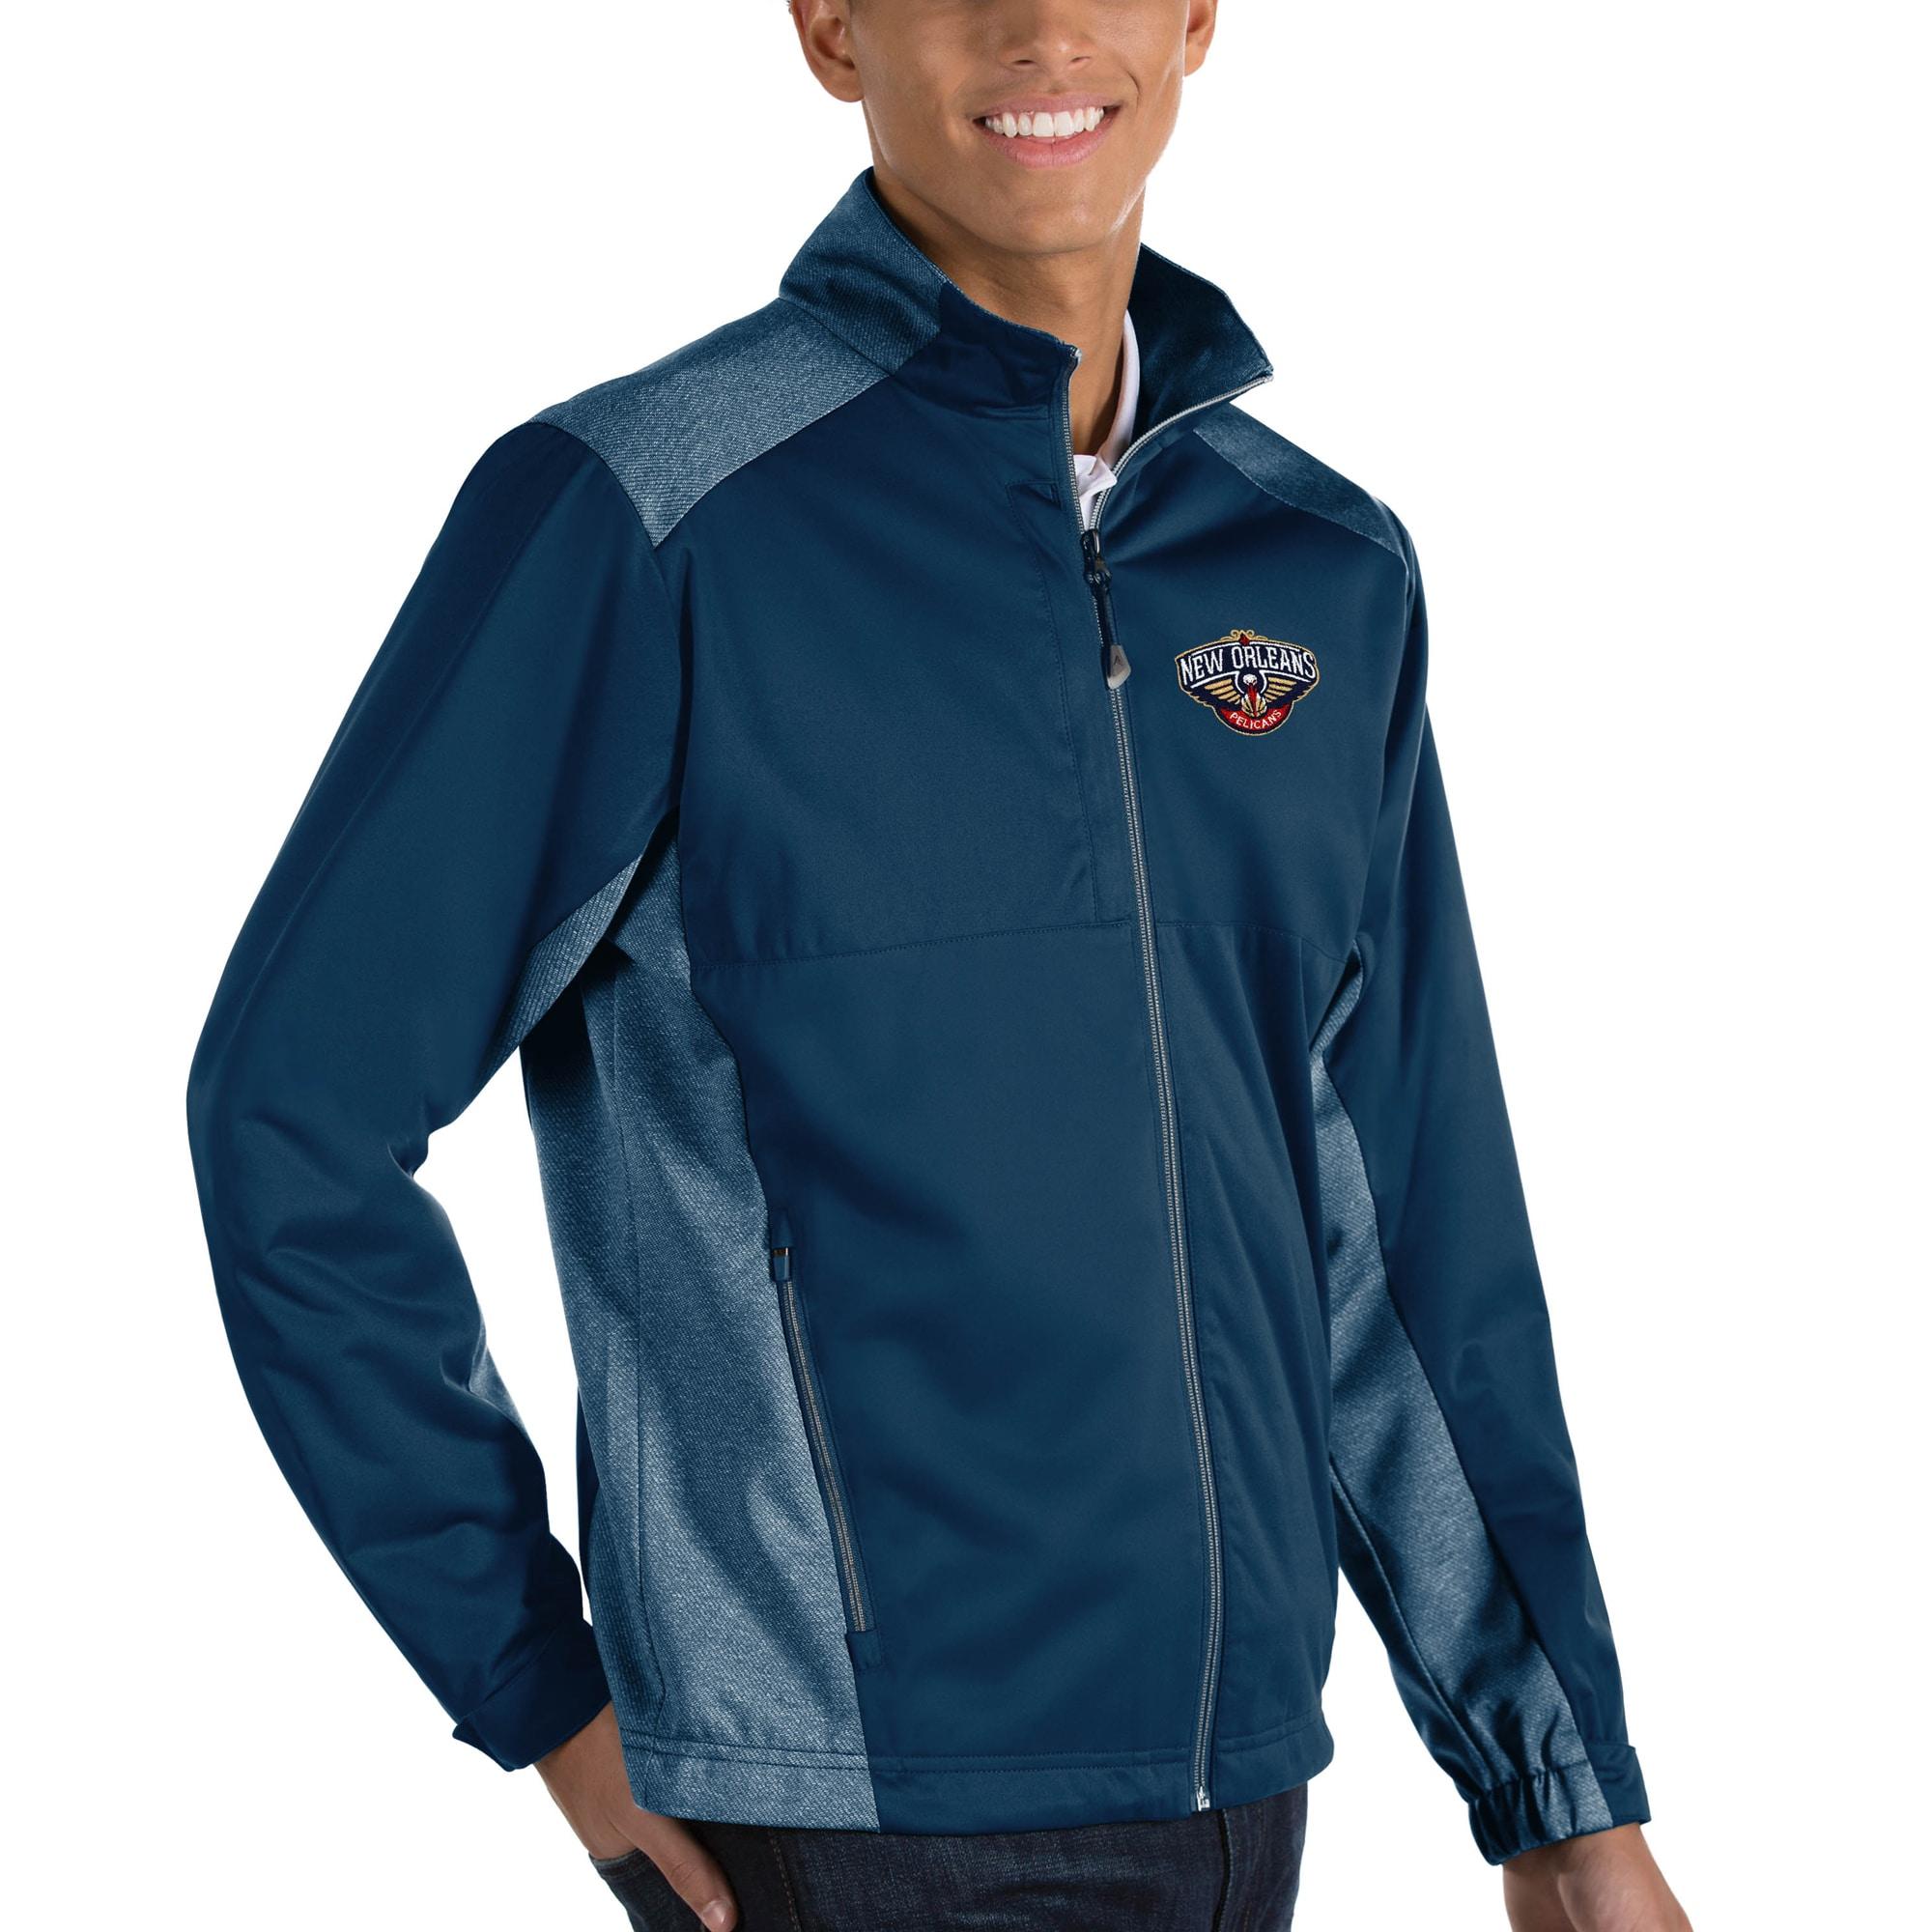 New Orleans Pelicans Antigua Revolve Full-Zip Jacket - Navy